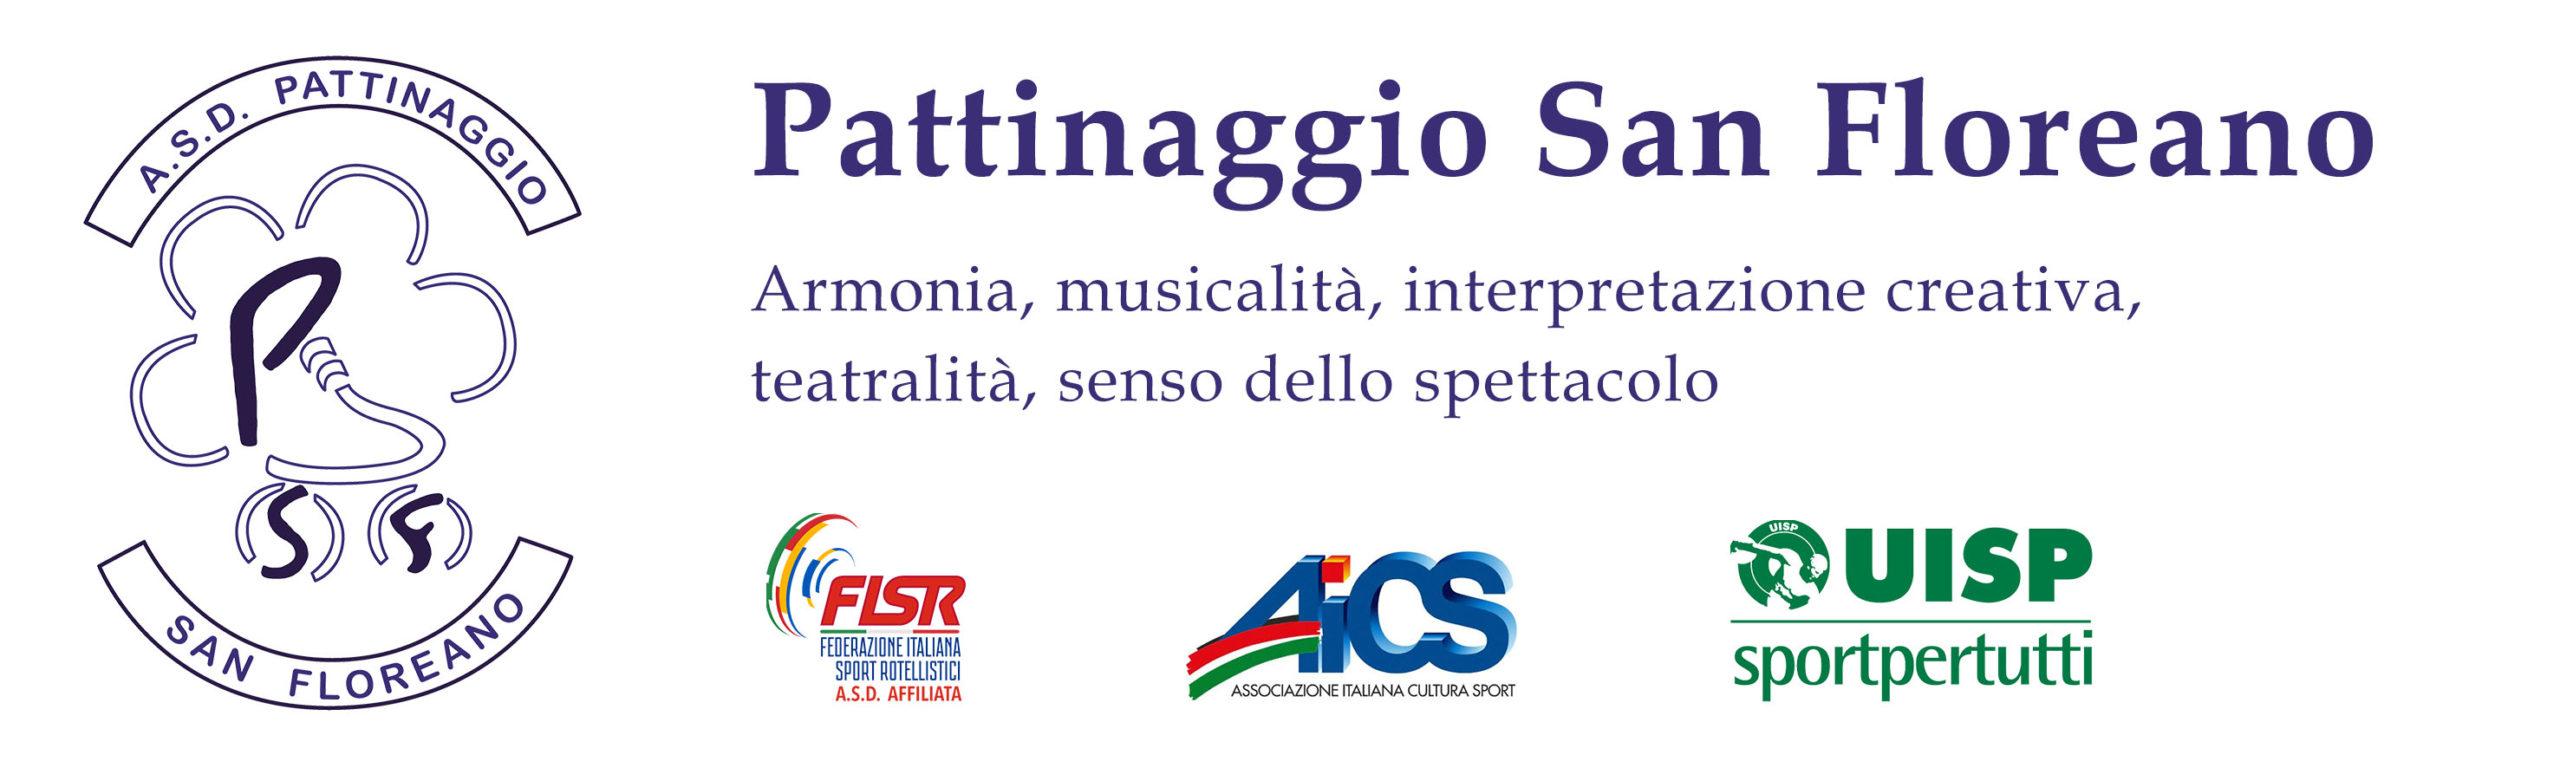 A.S.D. Pattinaggio San Floreano